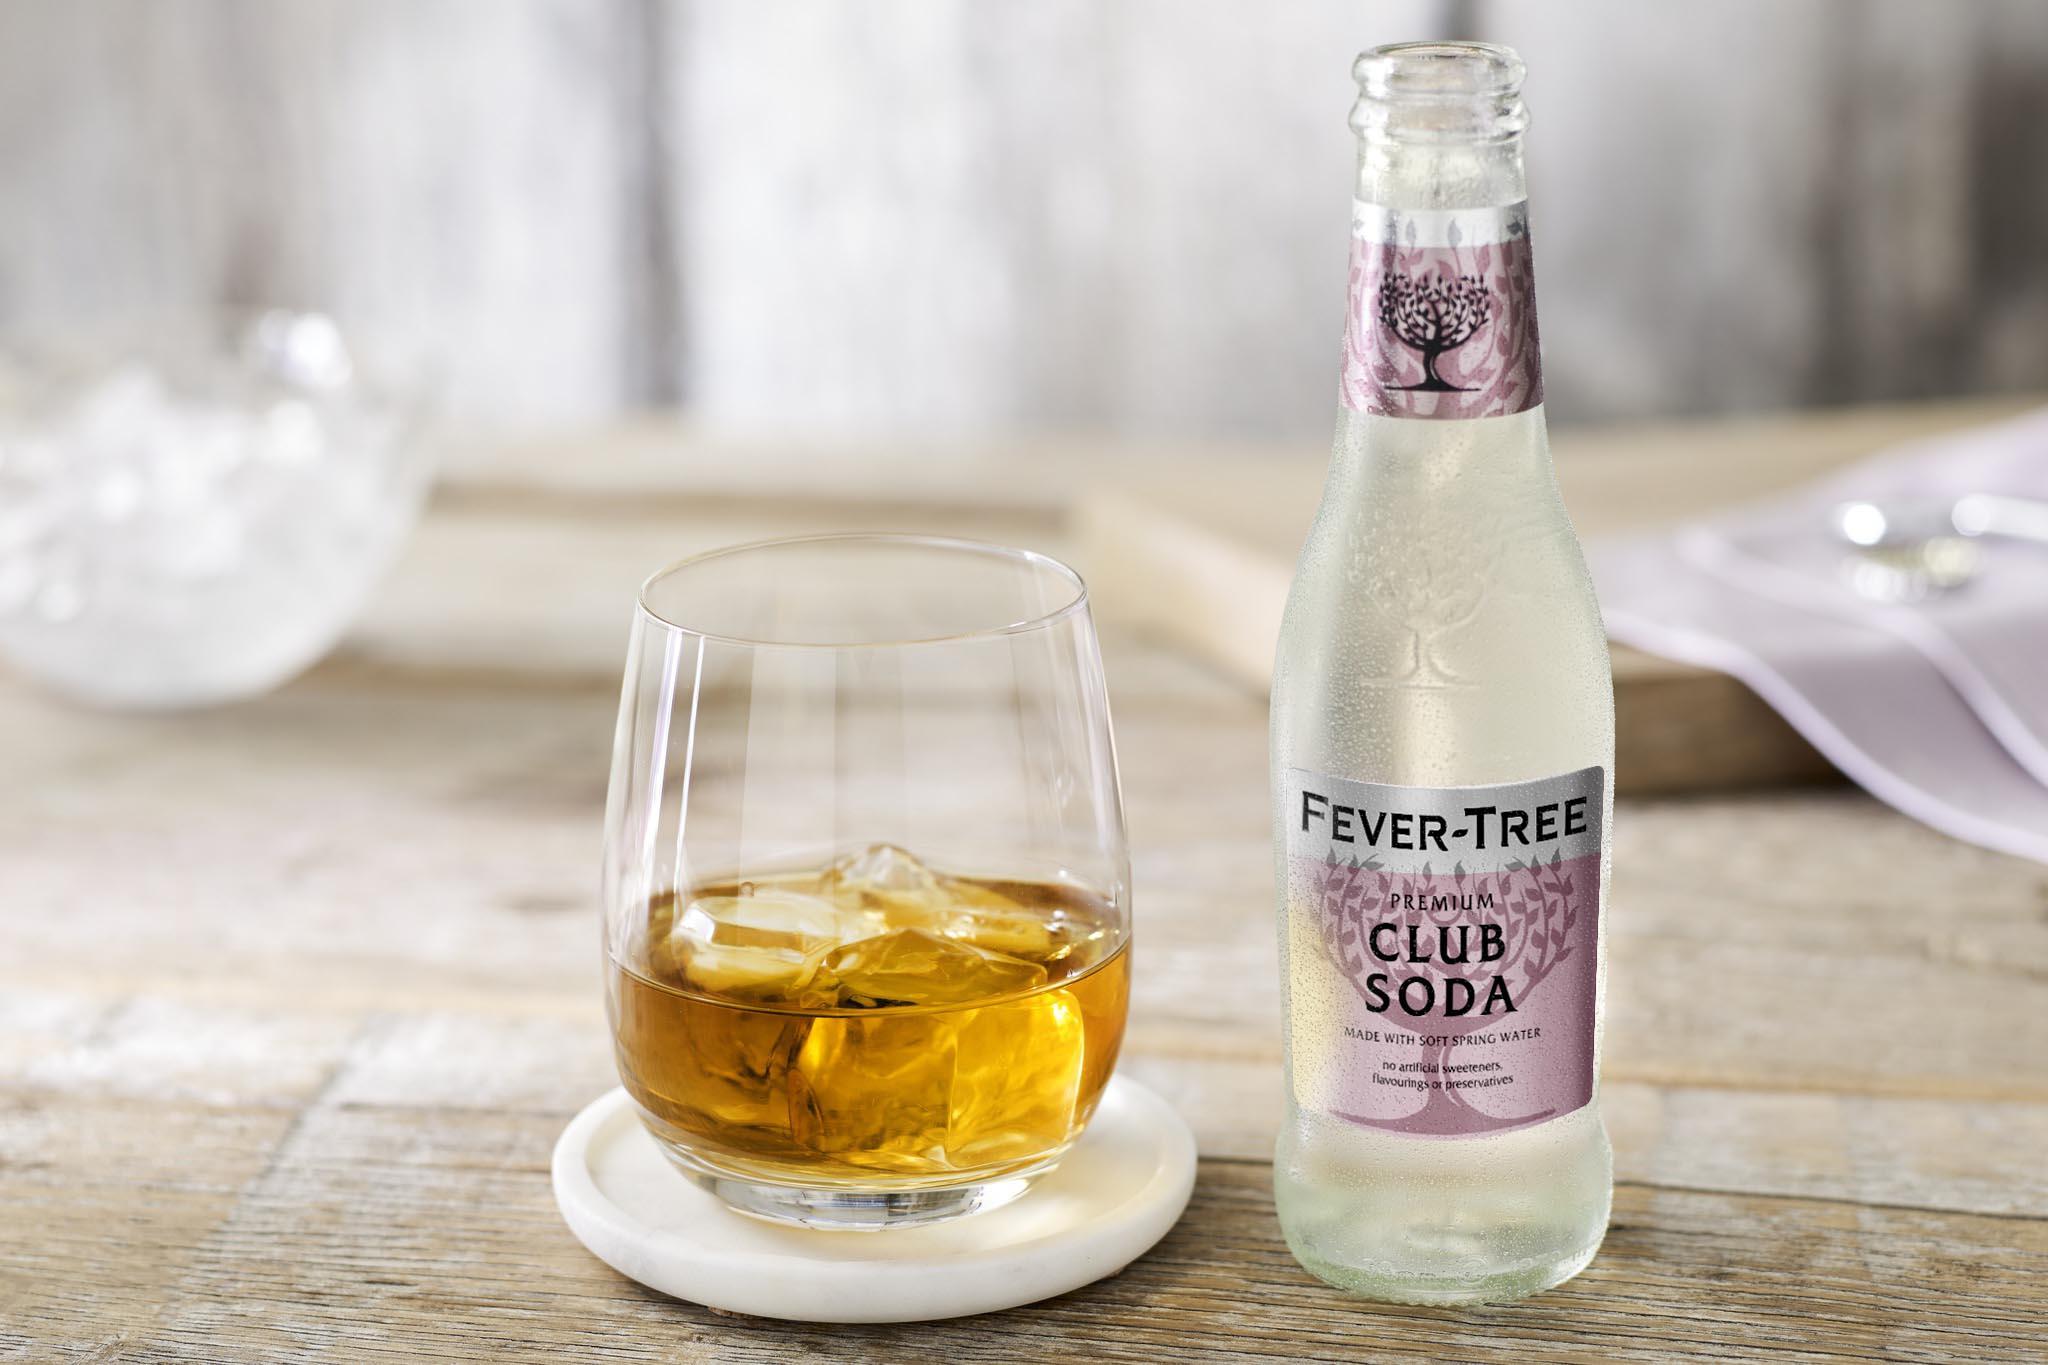 fevertree-club-soda-lowball-soda-whisky-lifestyle-small